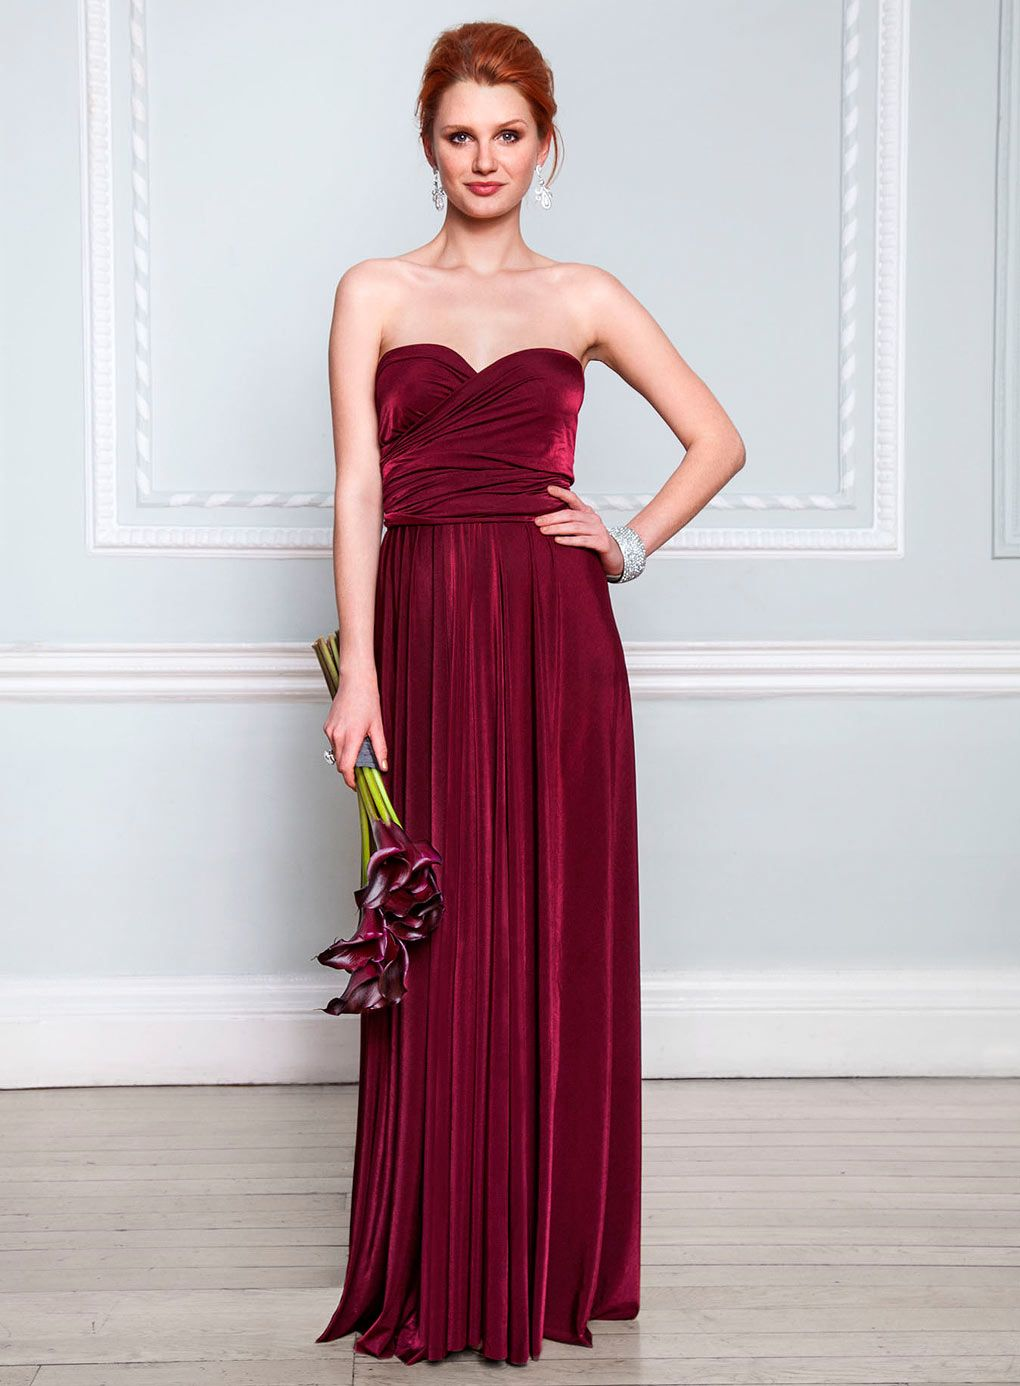 dessy bridesmaid dress (merlot) - Chrissy&-39-s Getting Married ...